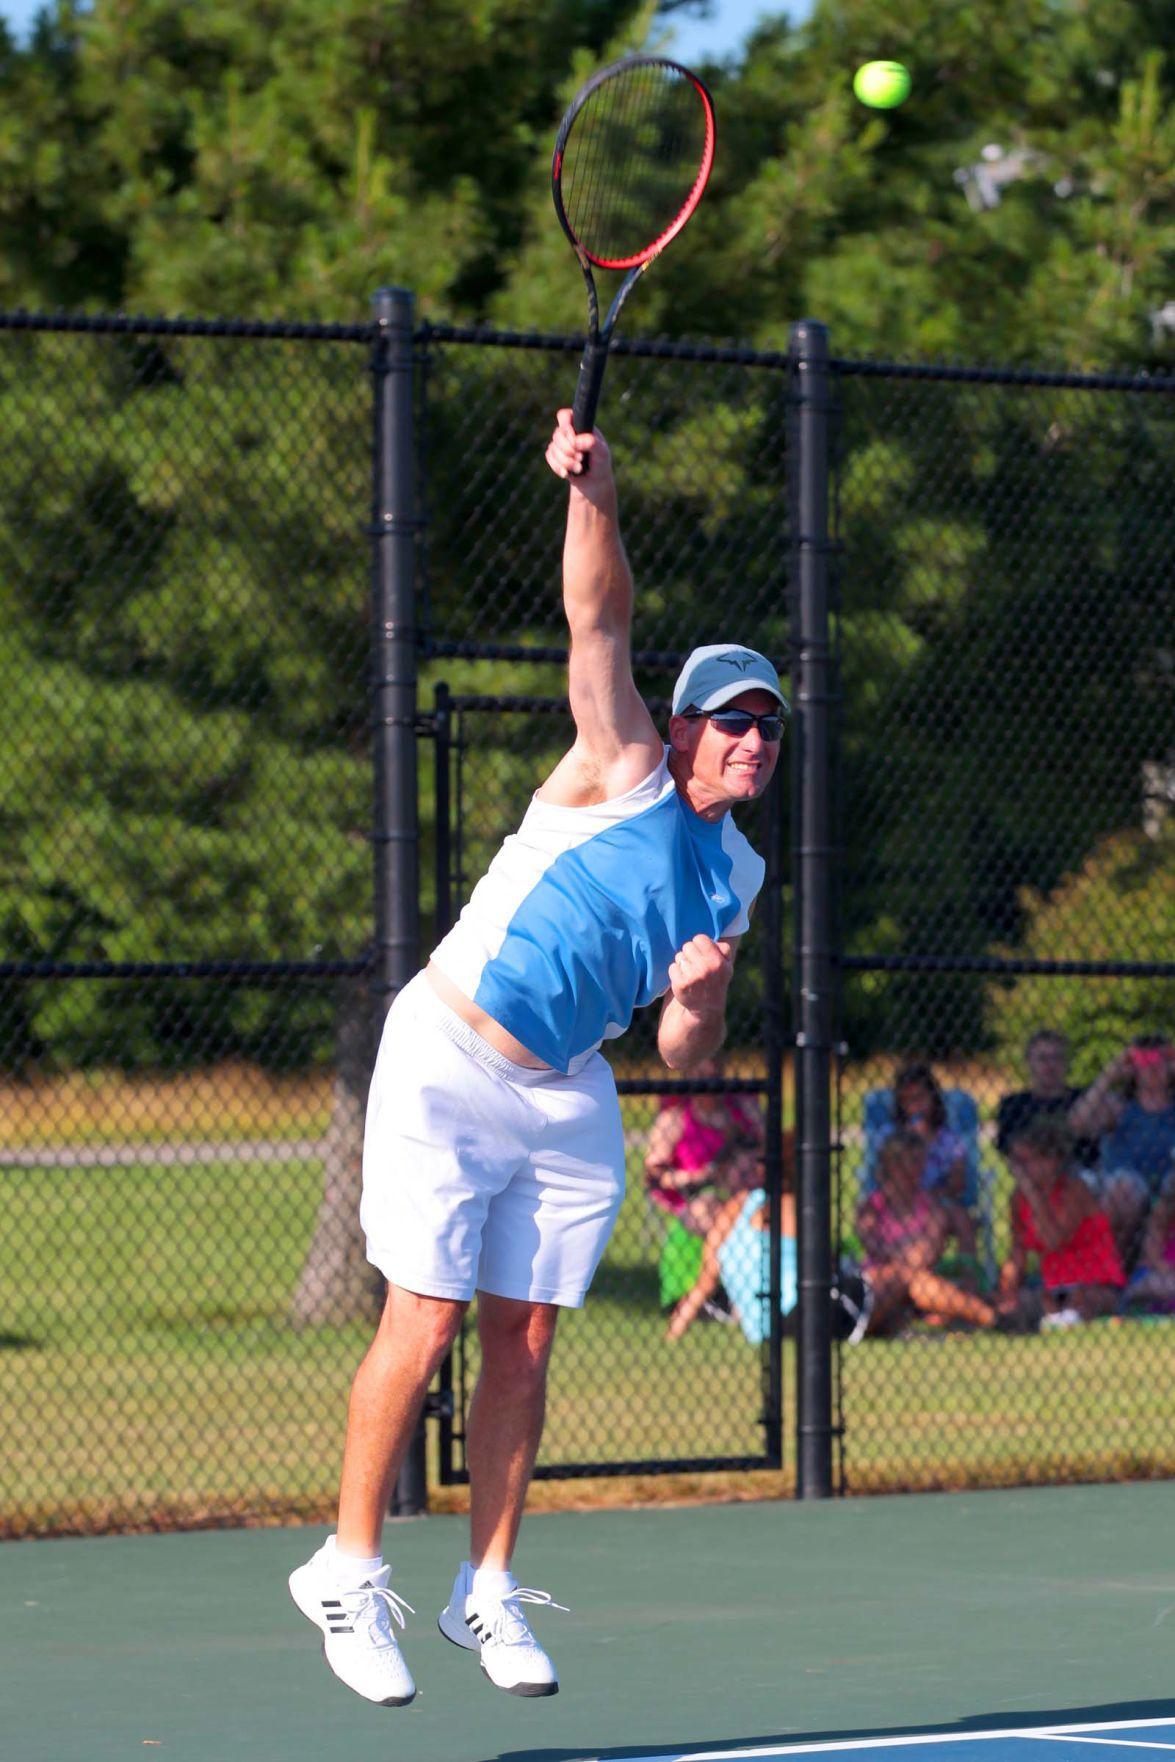 tennis_chris_webb_fc.jpg